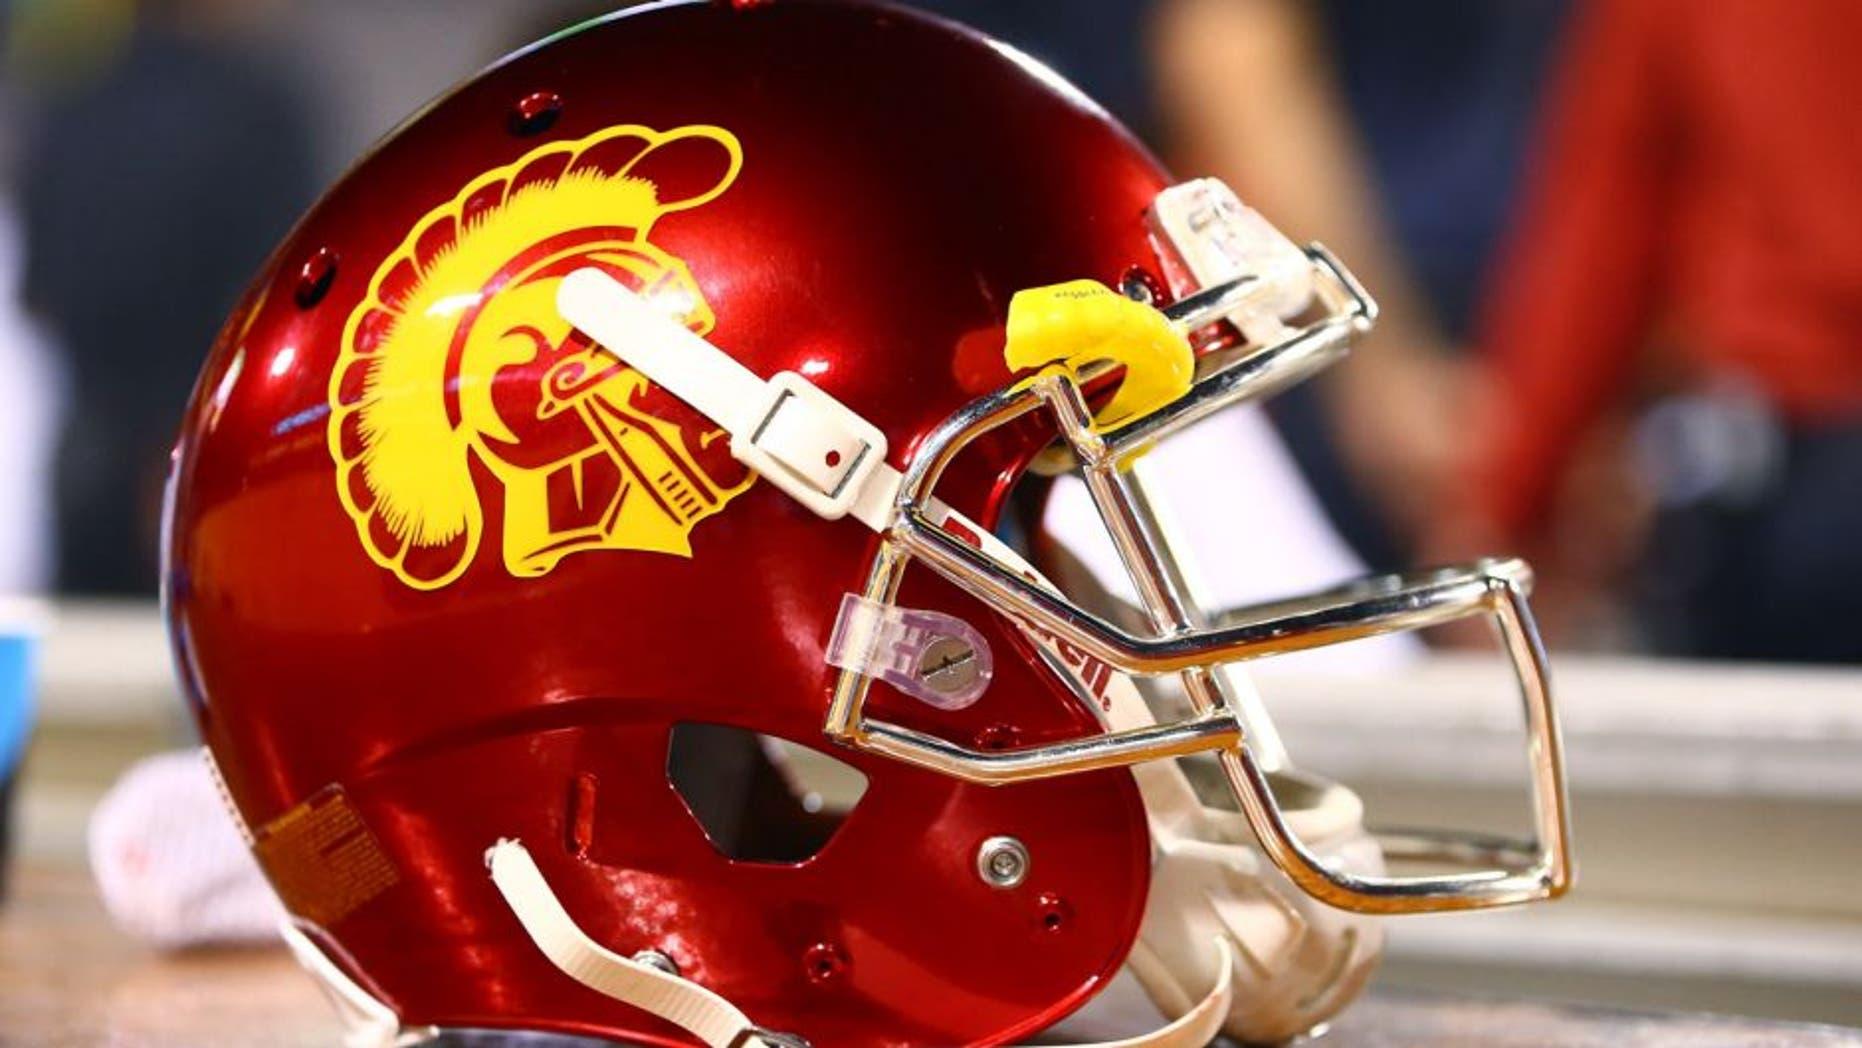 Sep 26, 2015; Tempe, AZ, USA; Detailed view of a Southern California Trojans helmet against the Arizona State Sun Devils at Sun Devil Stadium. Mandatory Credit: Mark J. Rebilas-USA TODAY Sports